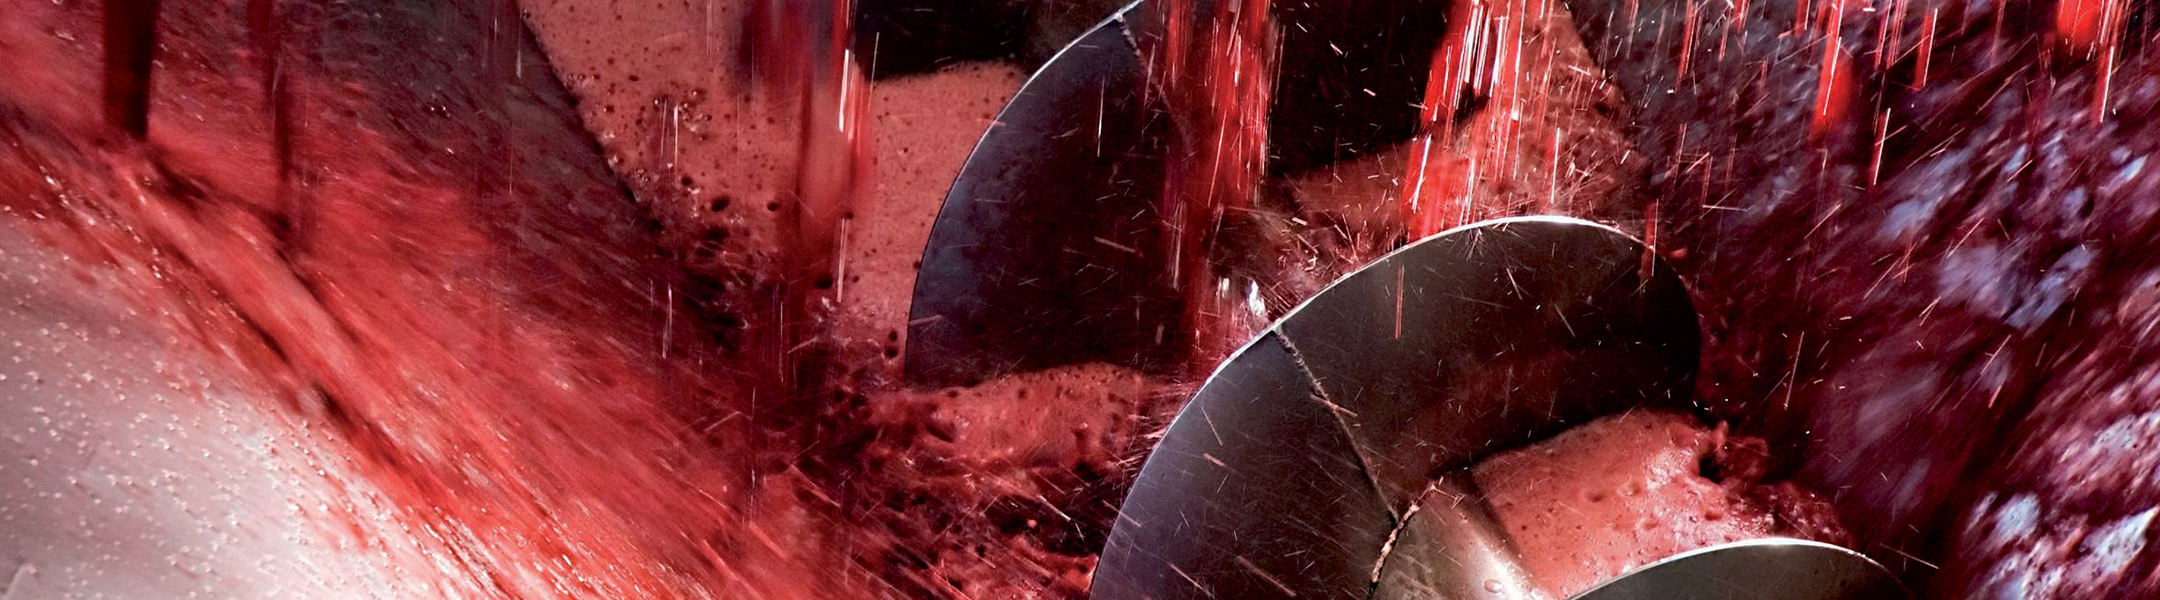 pavimentazioni industria vino